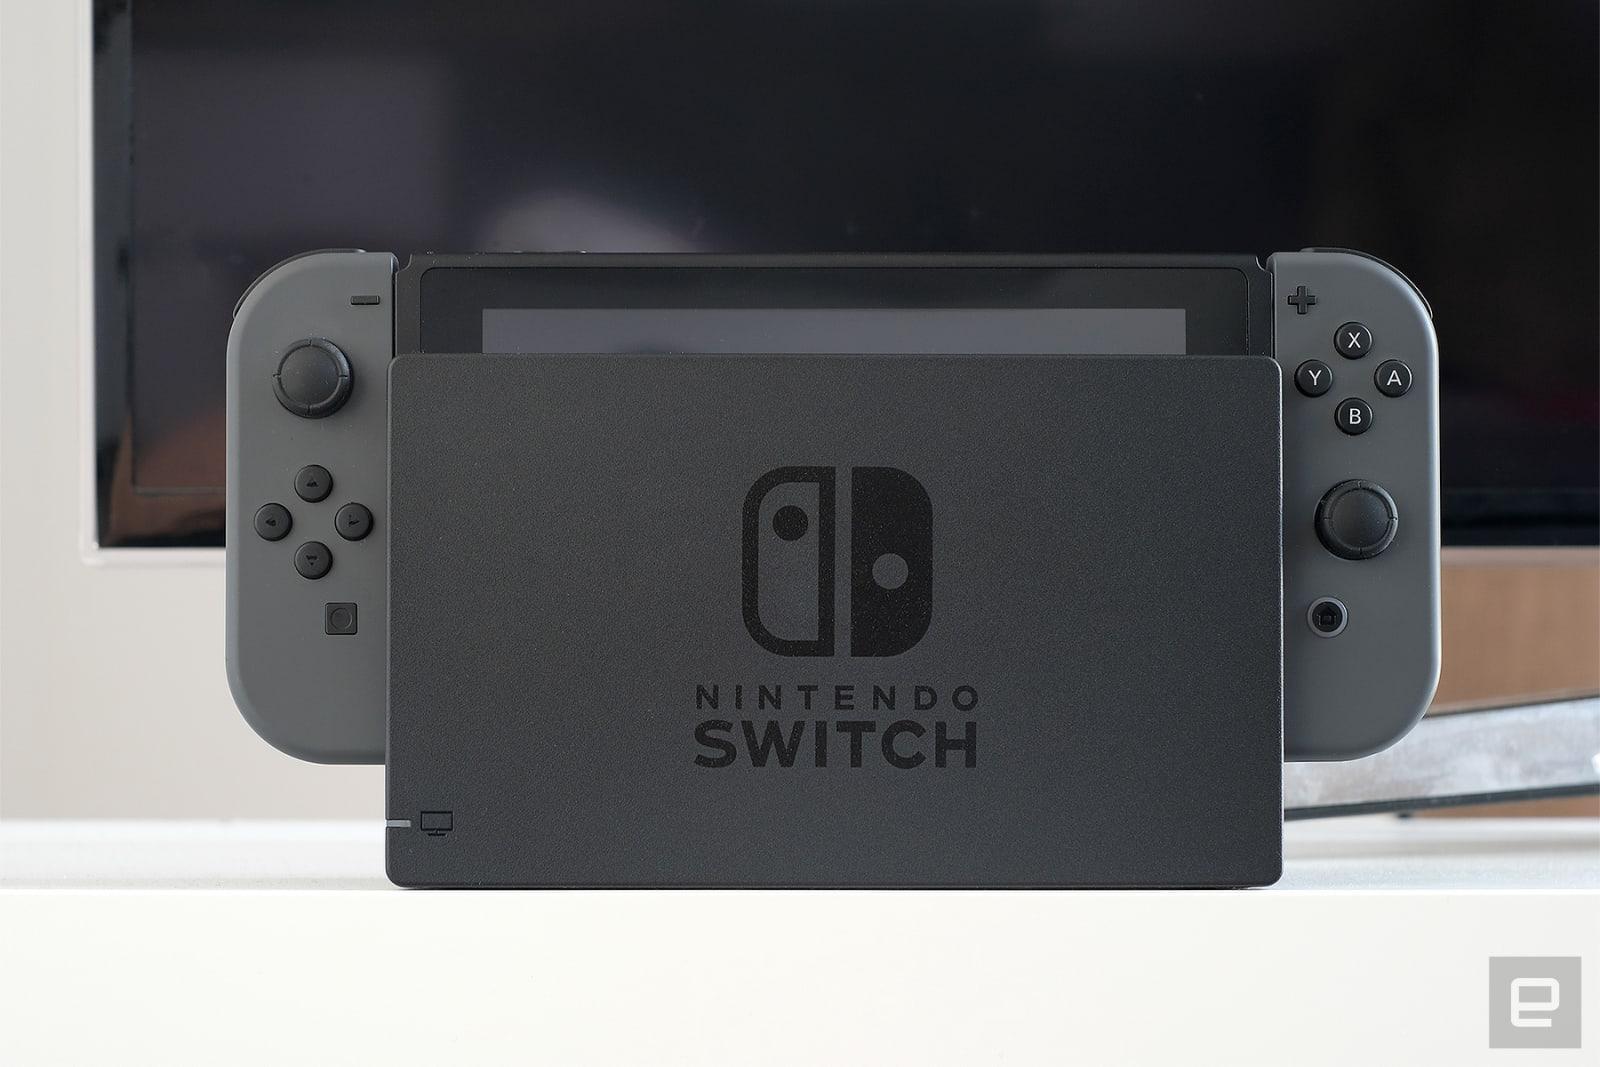 Docked Nintendo Switch